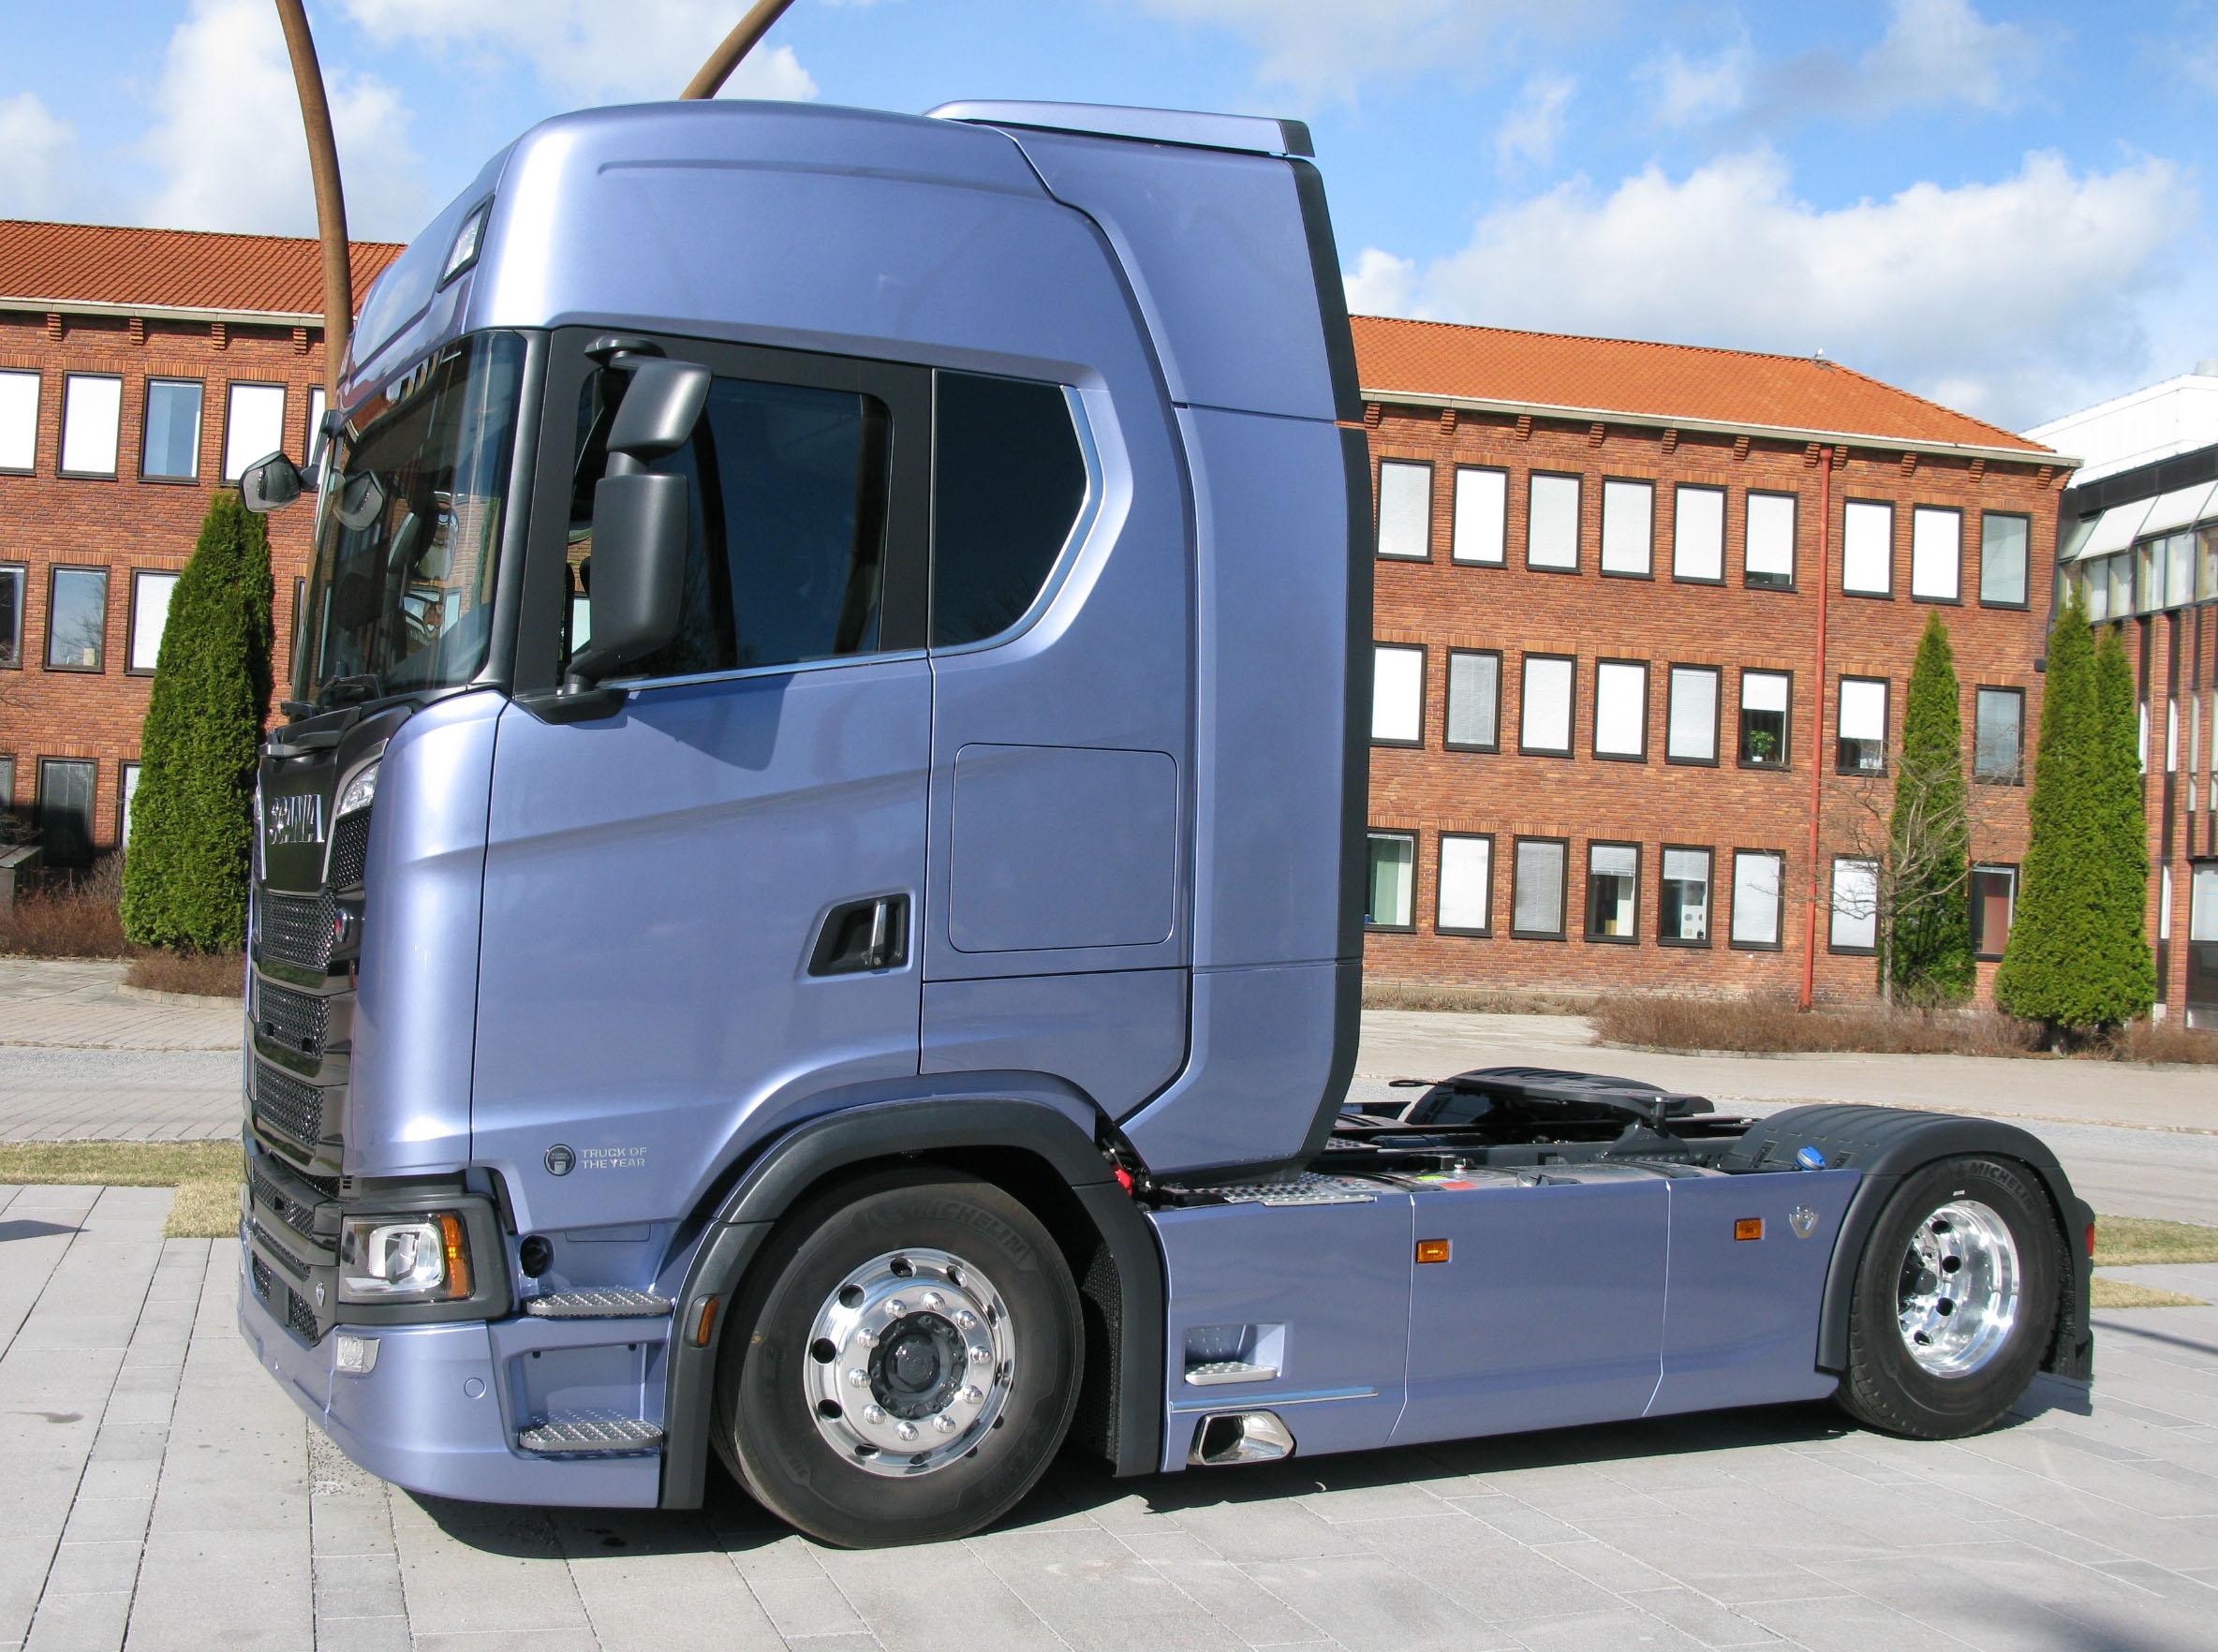 File:Scania S730 3 jpg - Wikimedia Commons